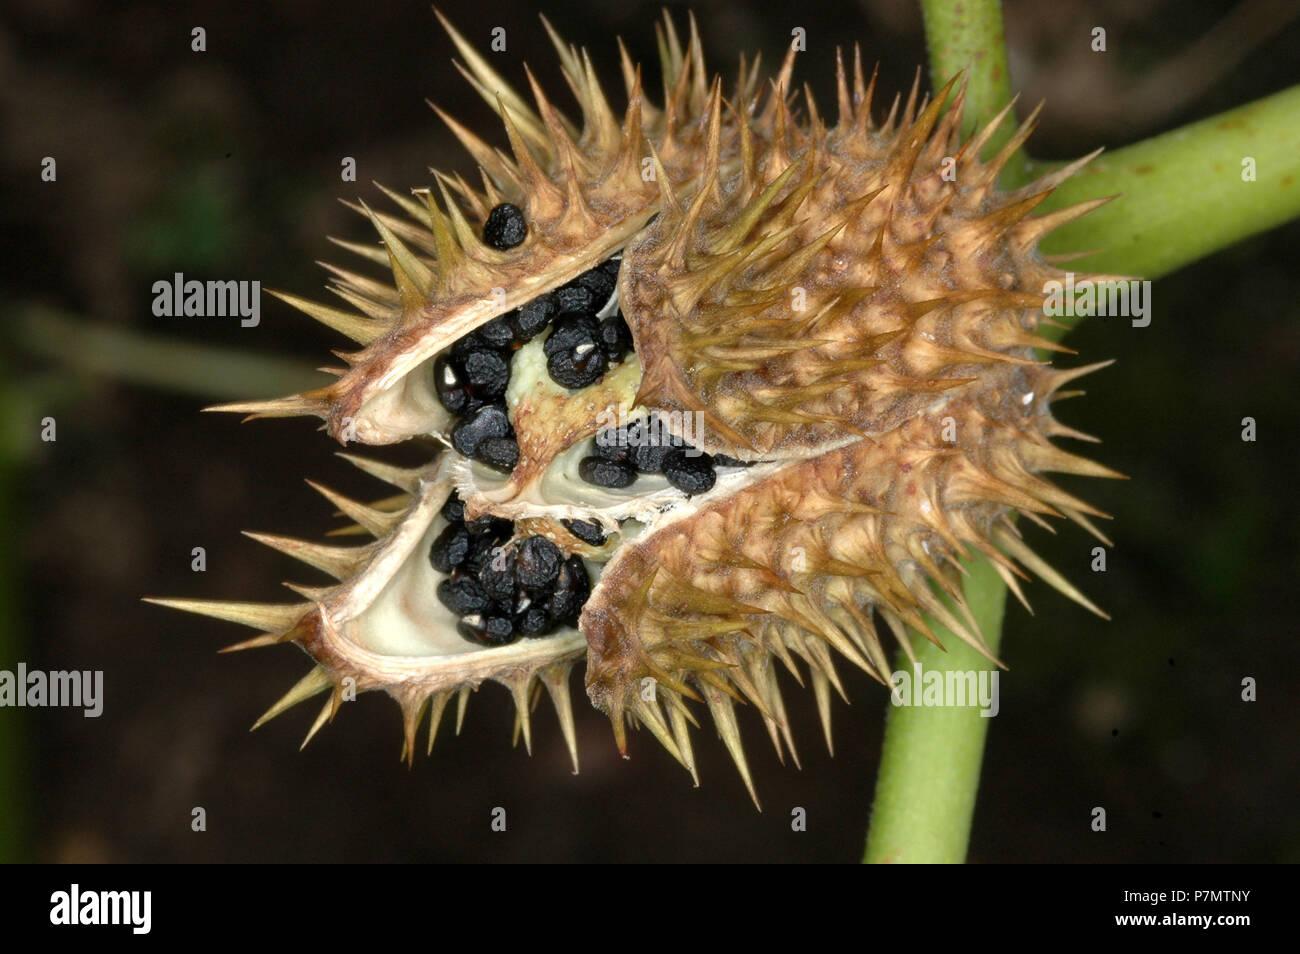 Capsule with seeds of Thorn-apple (Datura stramonium) - Stock Image